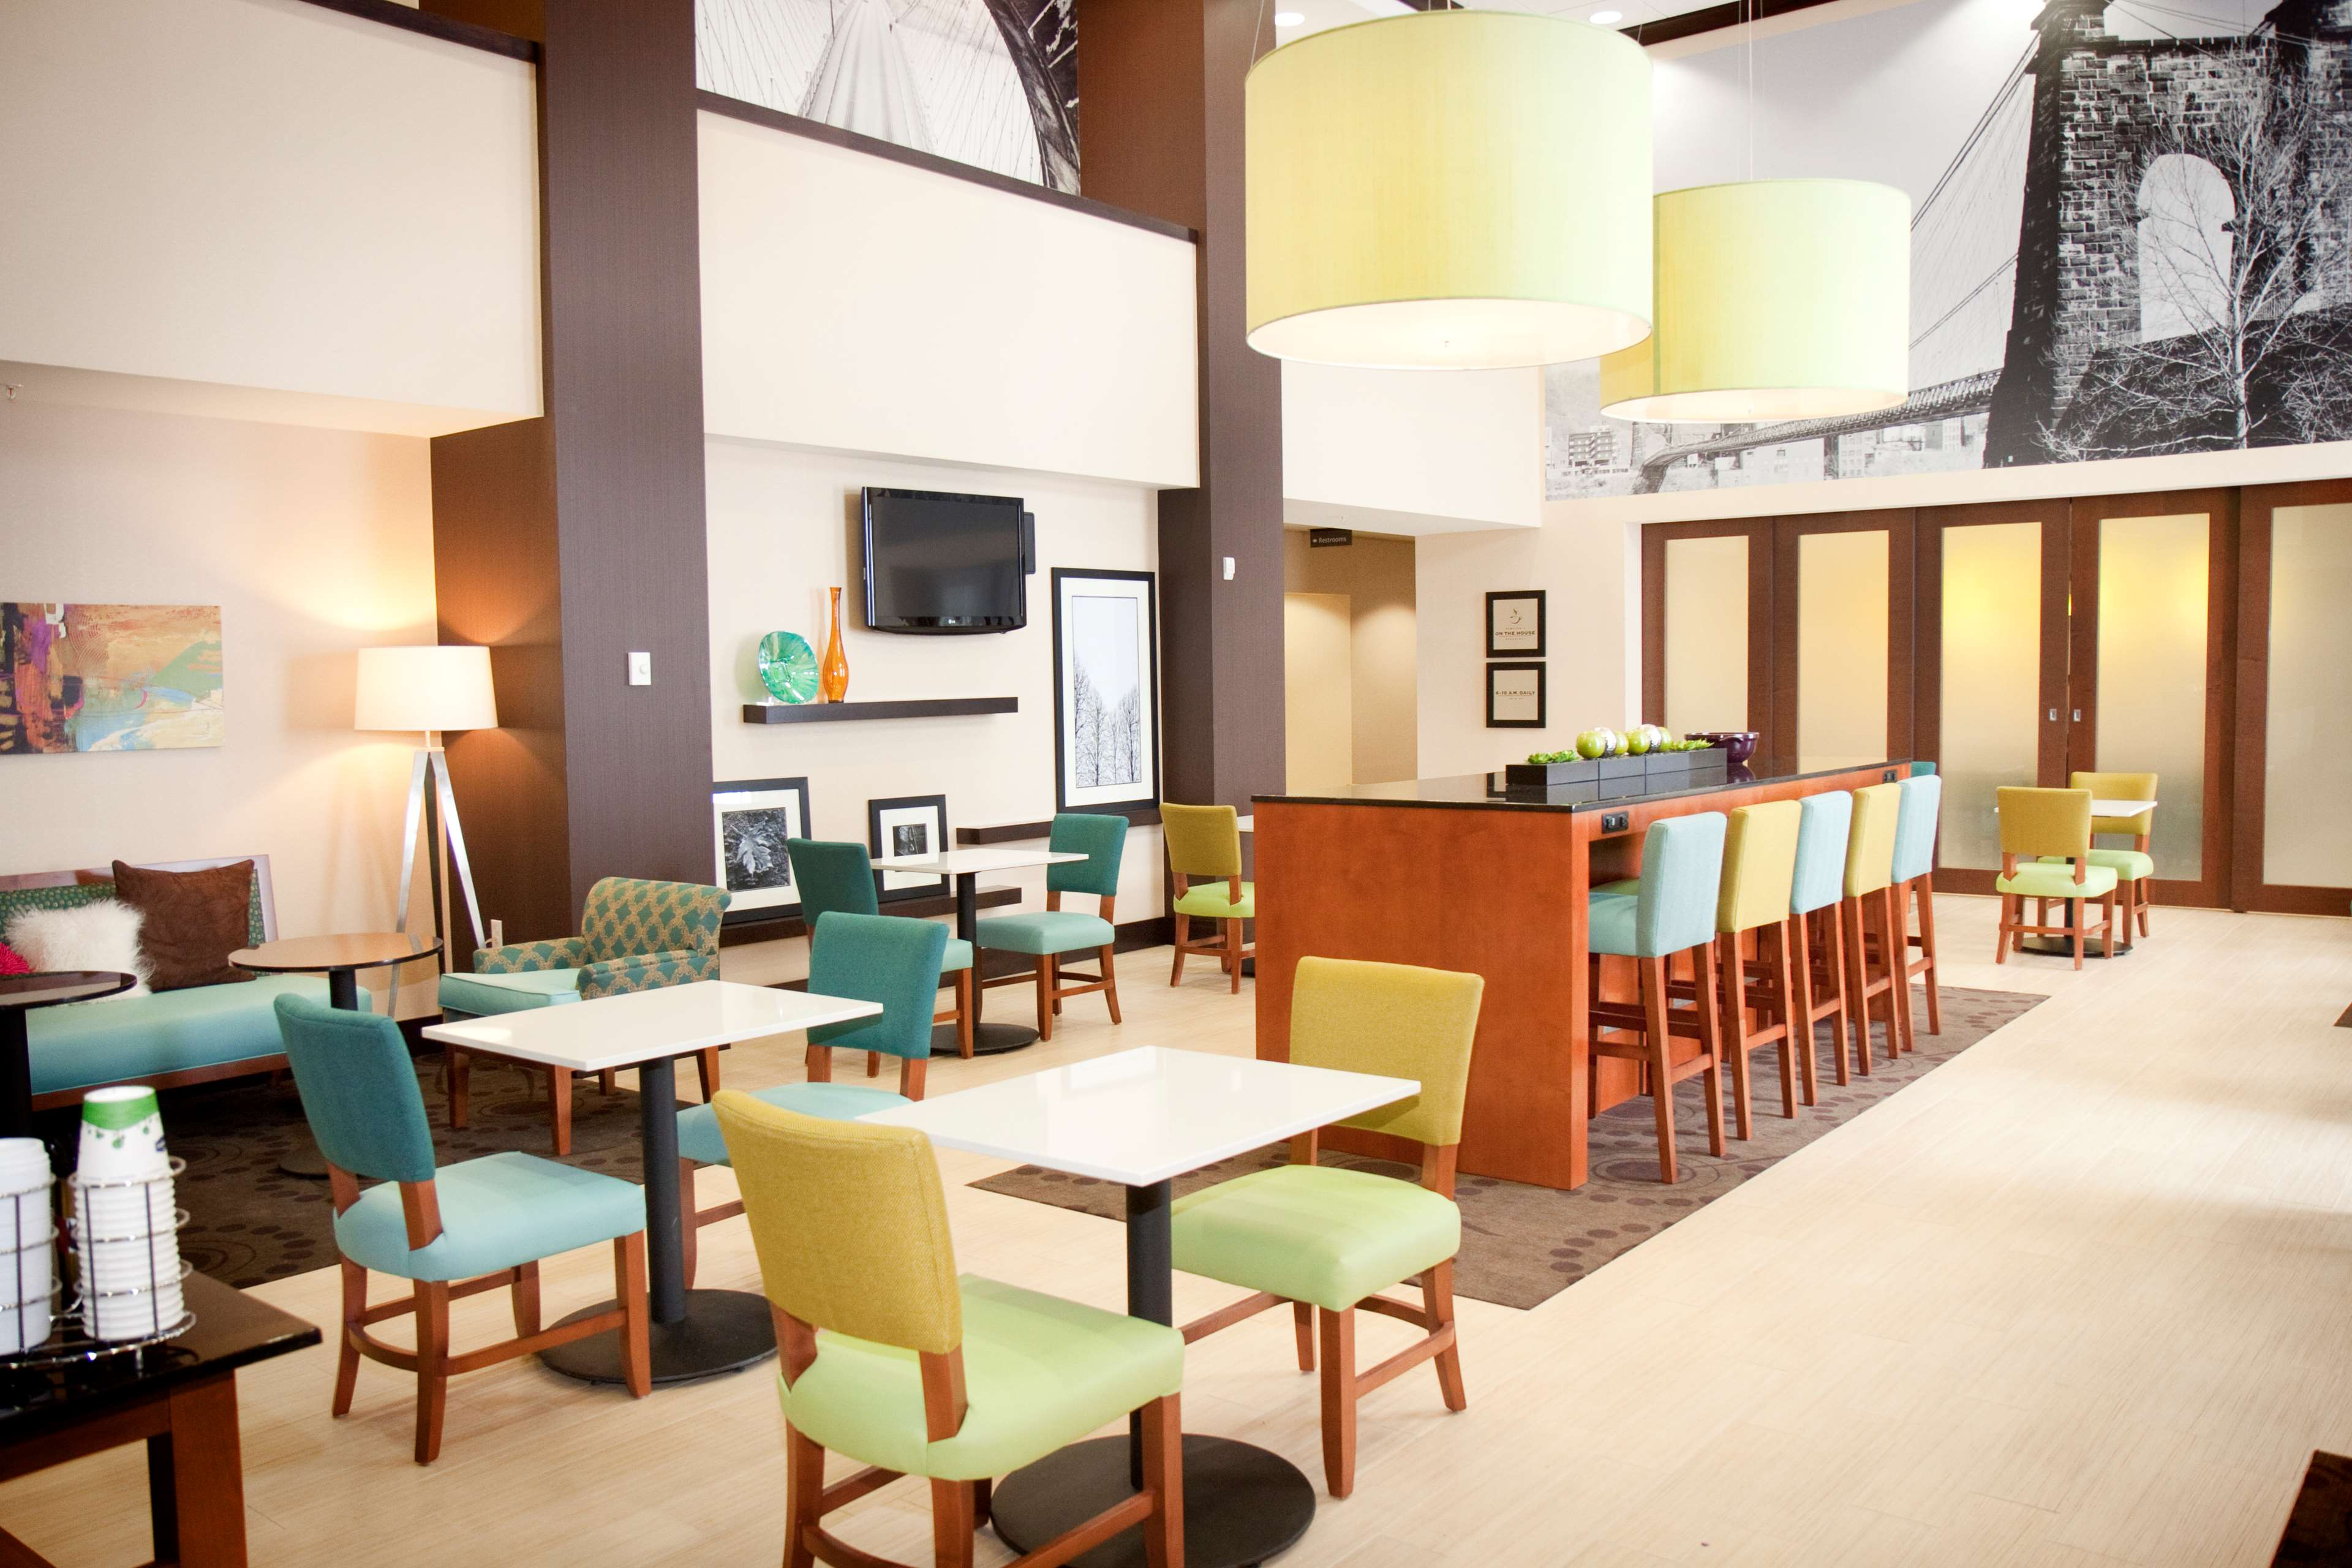 Hampton Inn & Suites Wheeling-The Highlands image 3